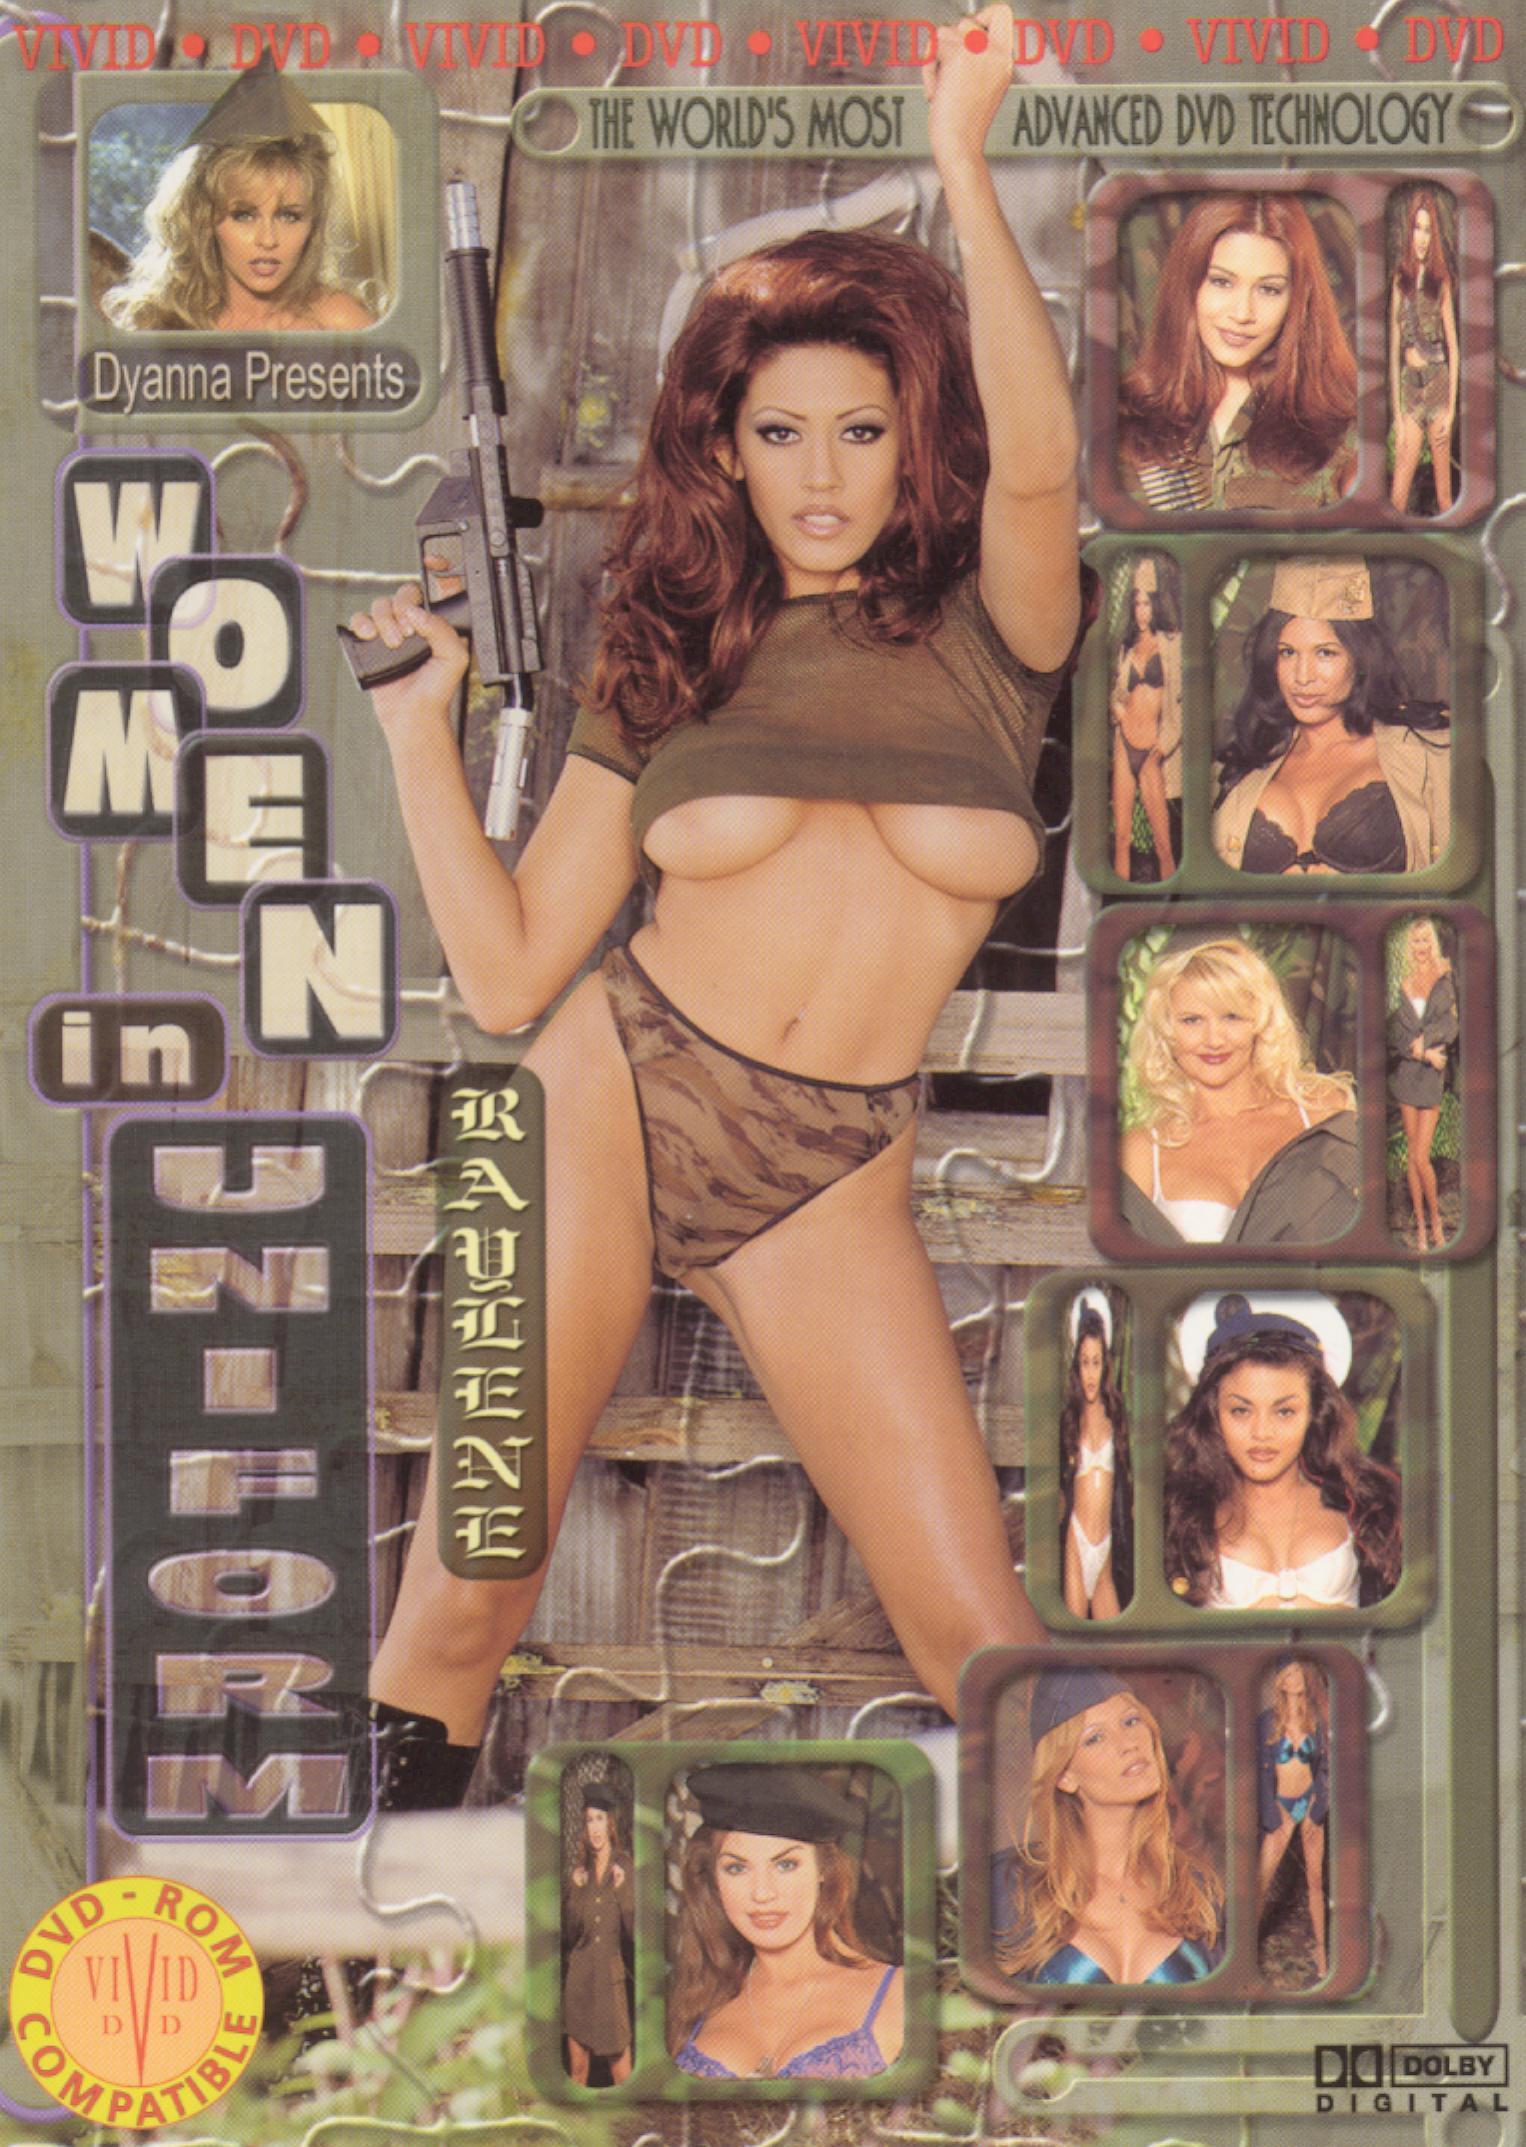 Dyanna Presents: Women in Uniform